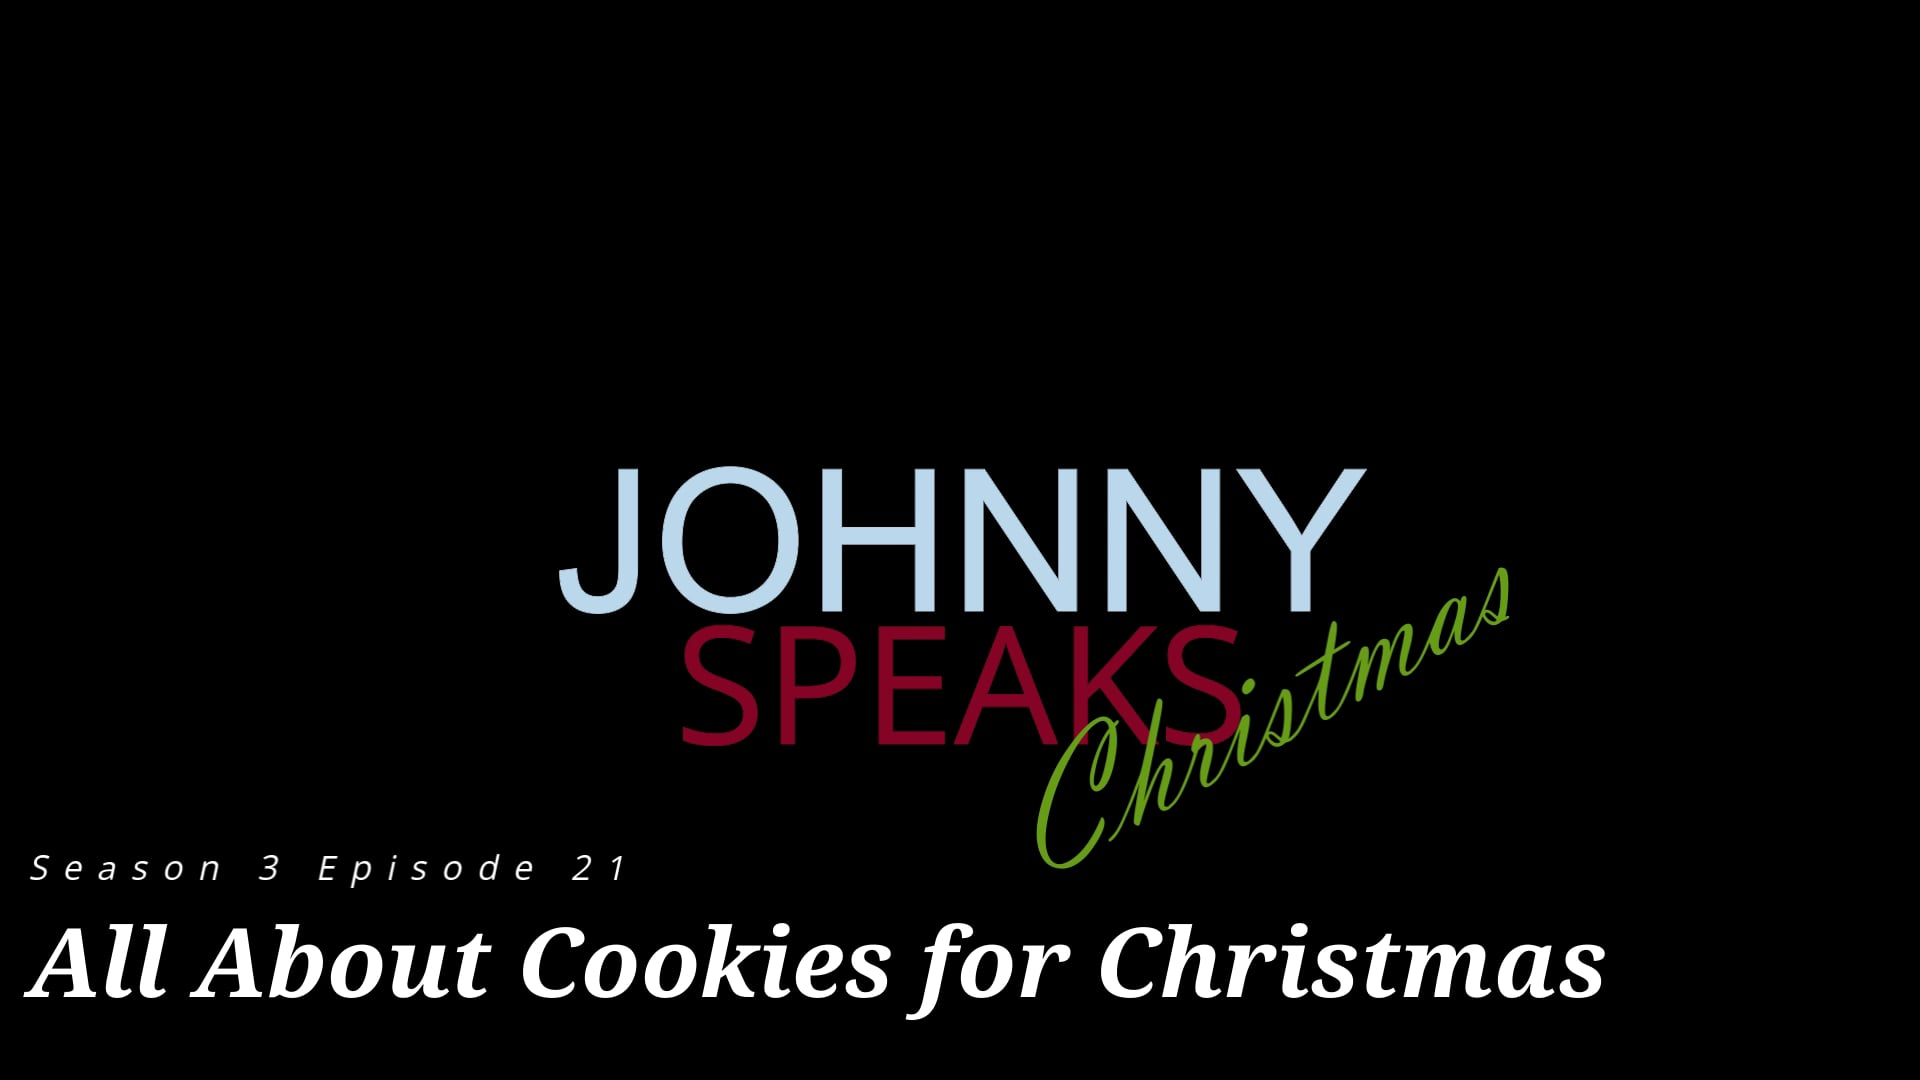 S3 E21 Cookies for Christmas